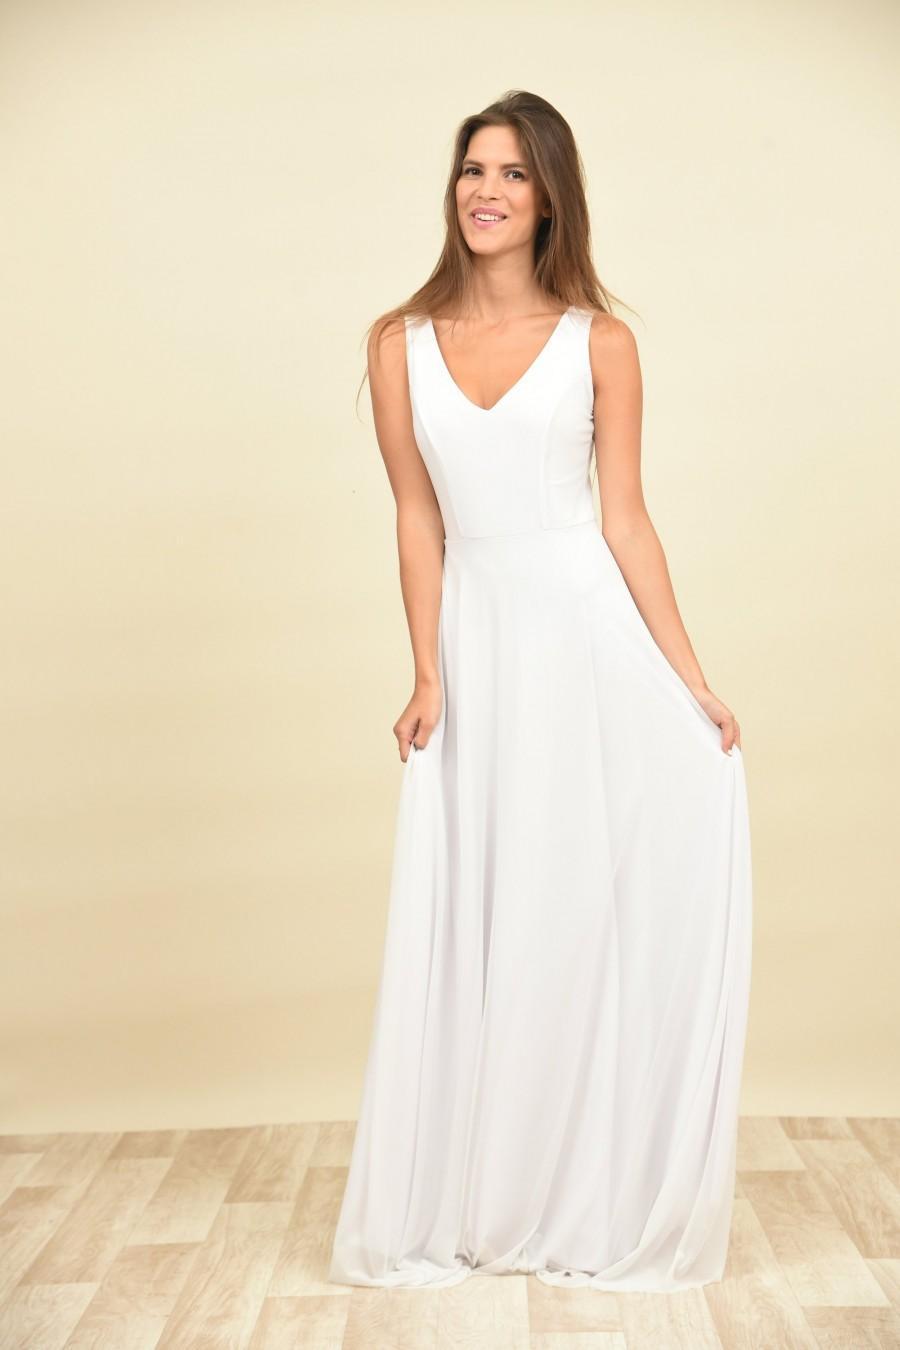 زفاف - Chiffon wedding dress, Simple wedding dress, Open back wedding dress, Maxi wedding dress, Bohemian bride, Moonflower Clean White